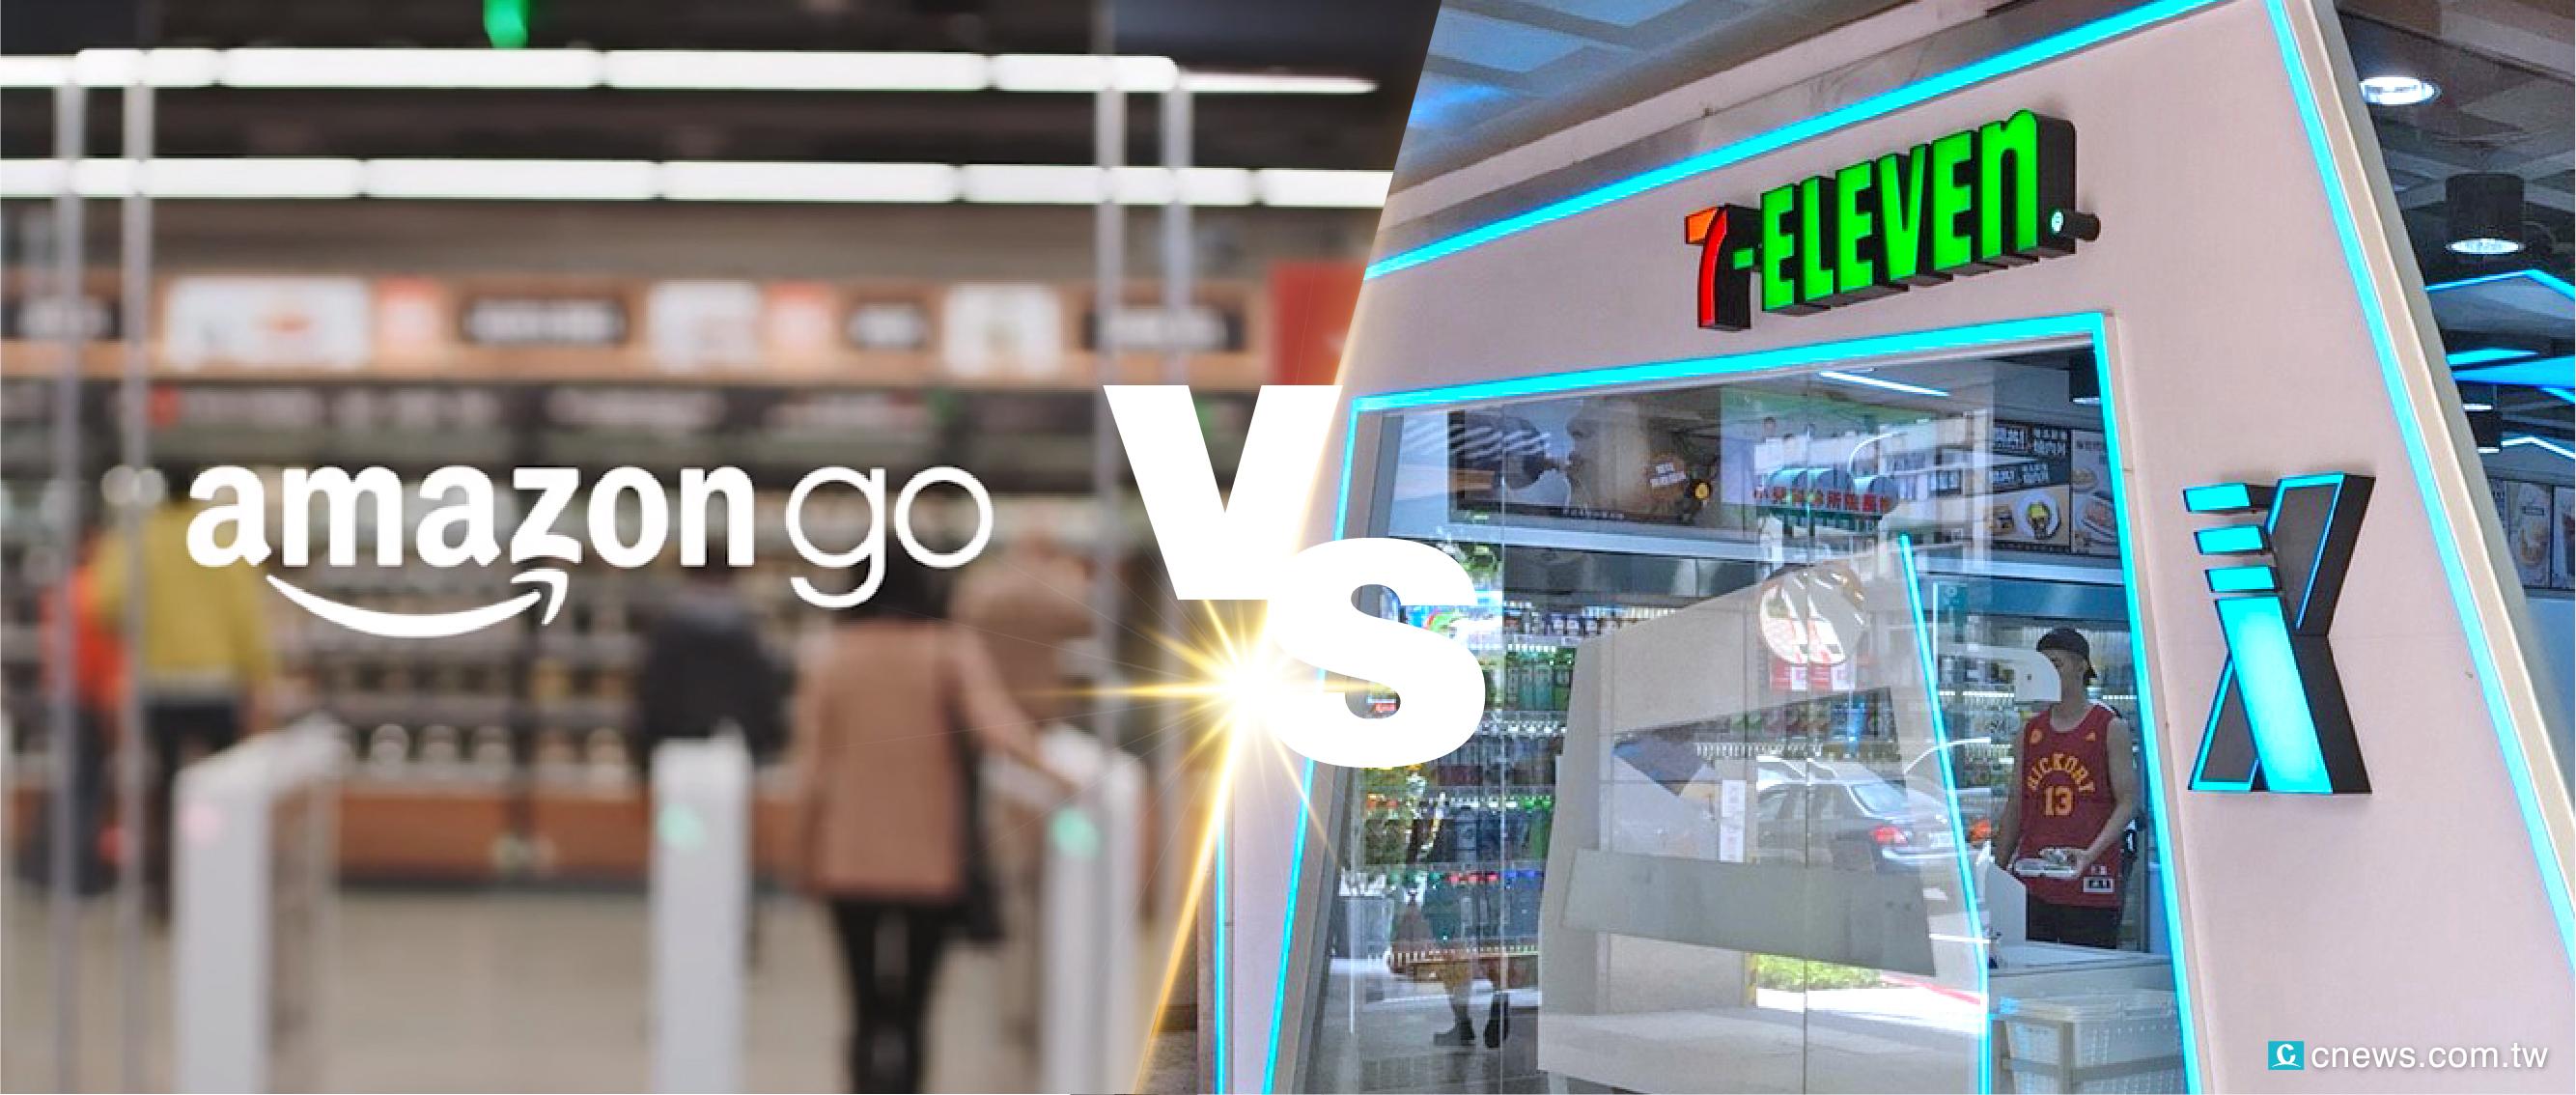 【無人商店殘酷擂台】Amazon Go  v.s. 小7 X-Store 究竟誰勝出?